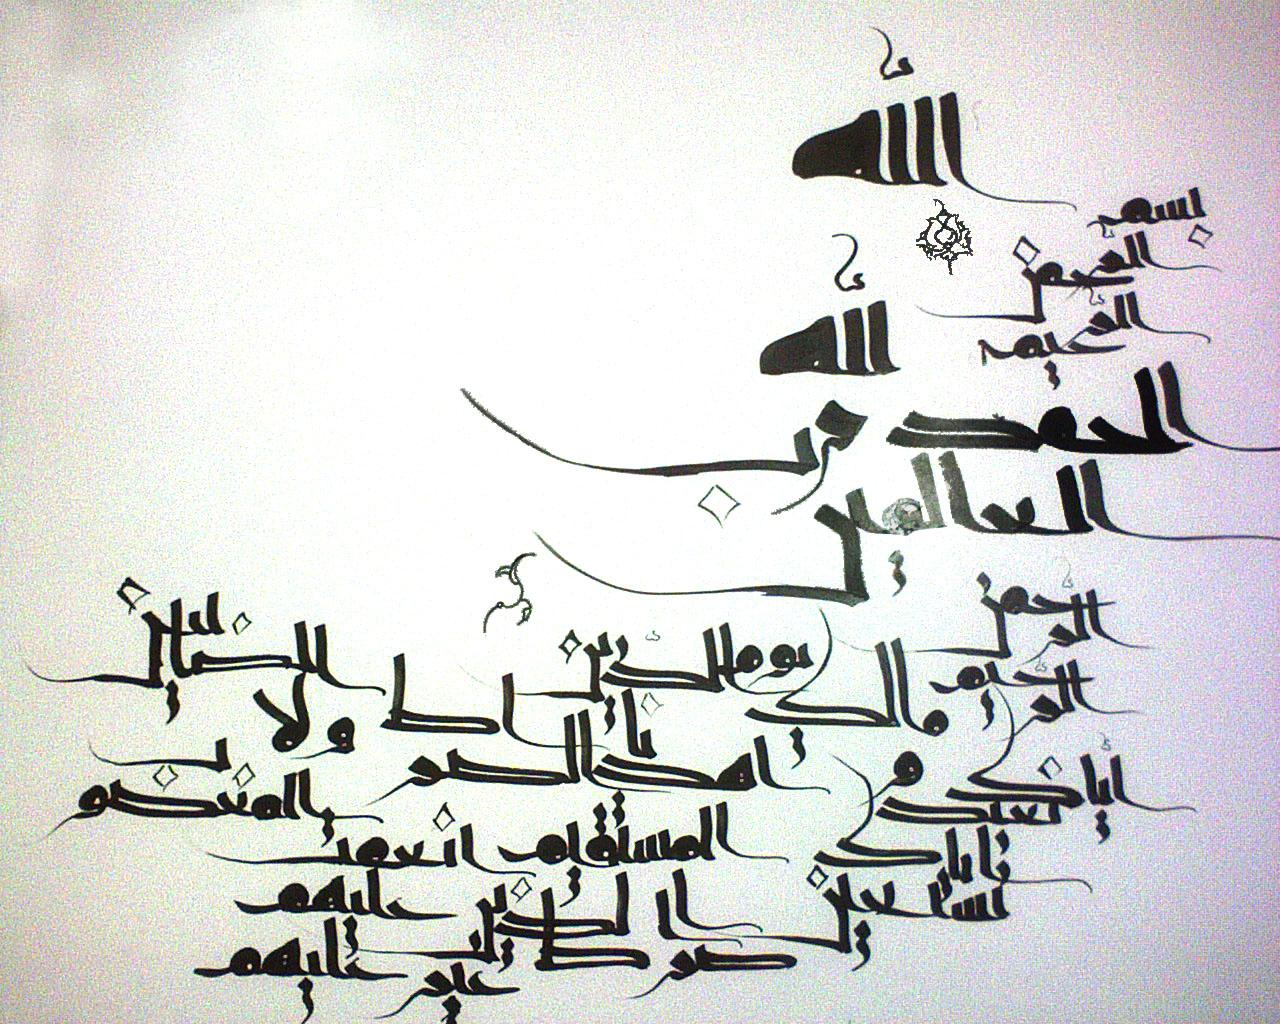 surah al  fatiha by HESAM222 - Surah Al-Fatihah Calligraphy